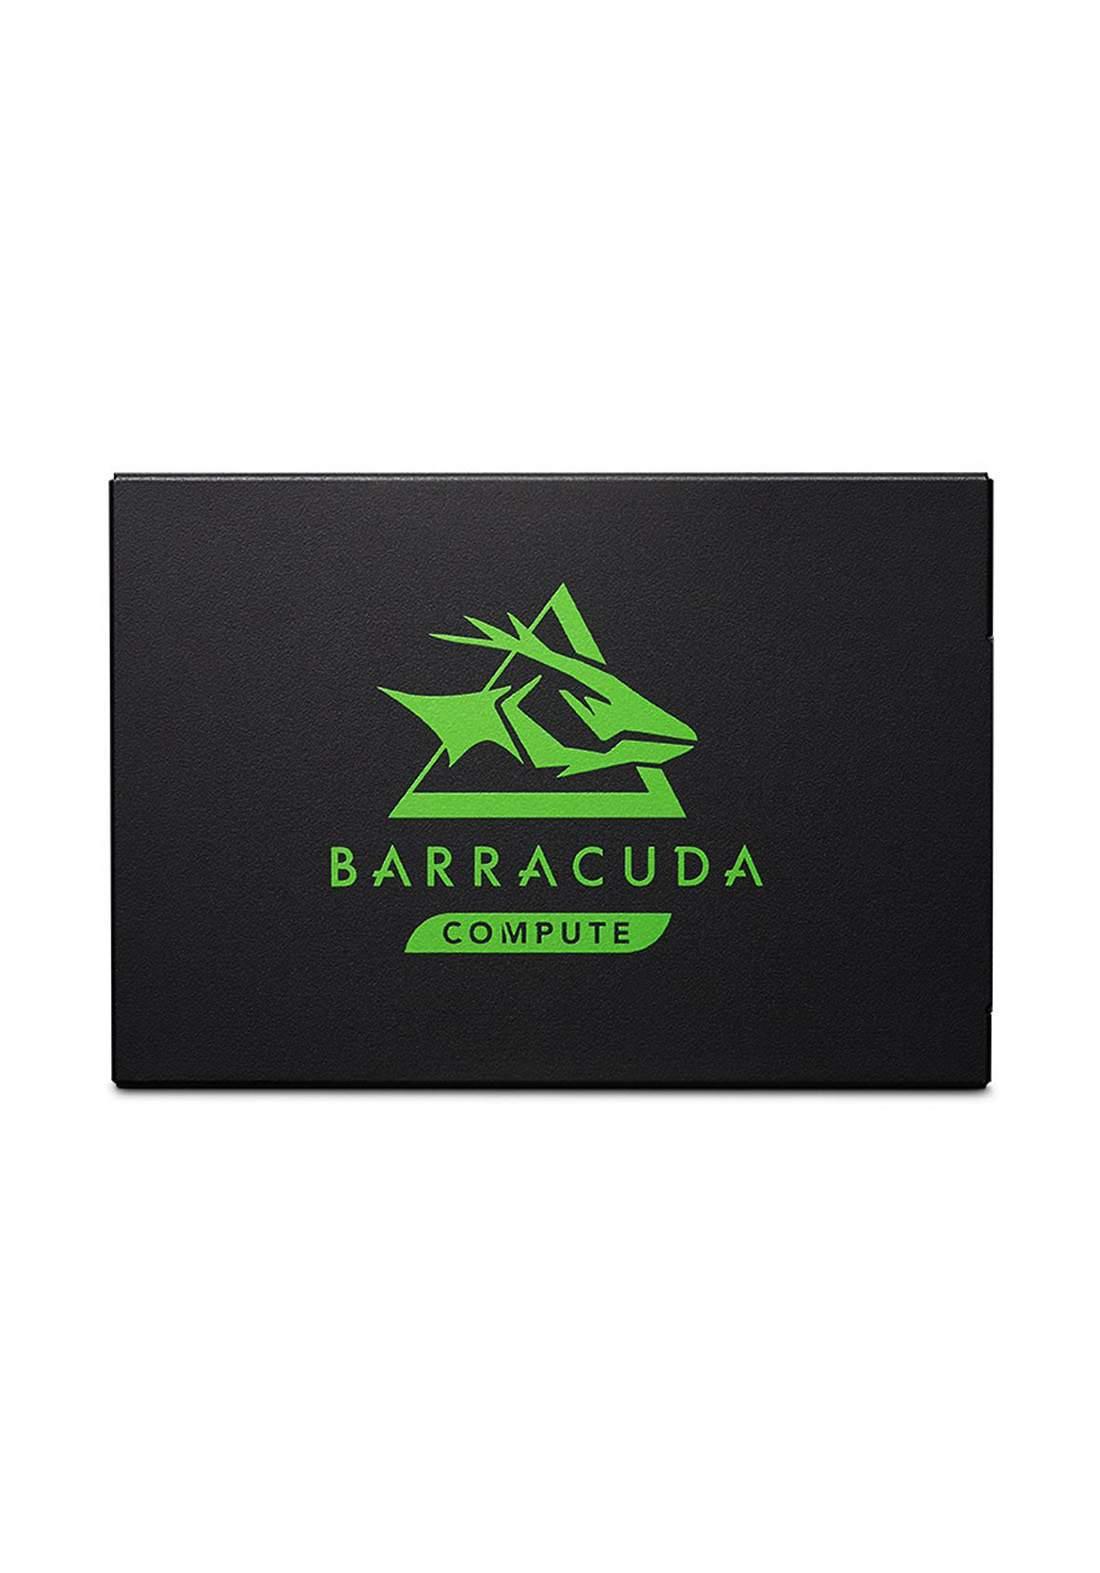 Seagate Barracuda 2.5 inch 500GB 3D TLC Internal Solid State Drive هارد داخلي